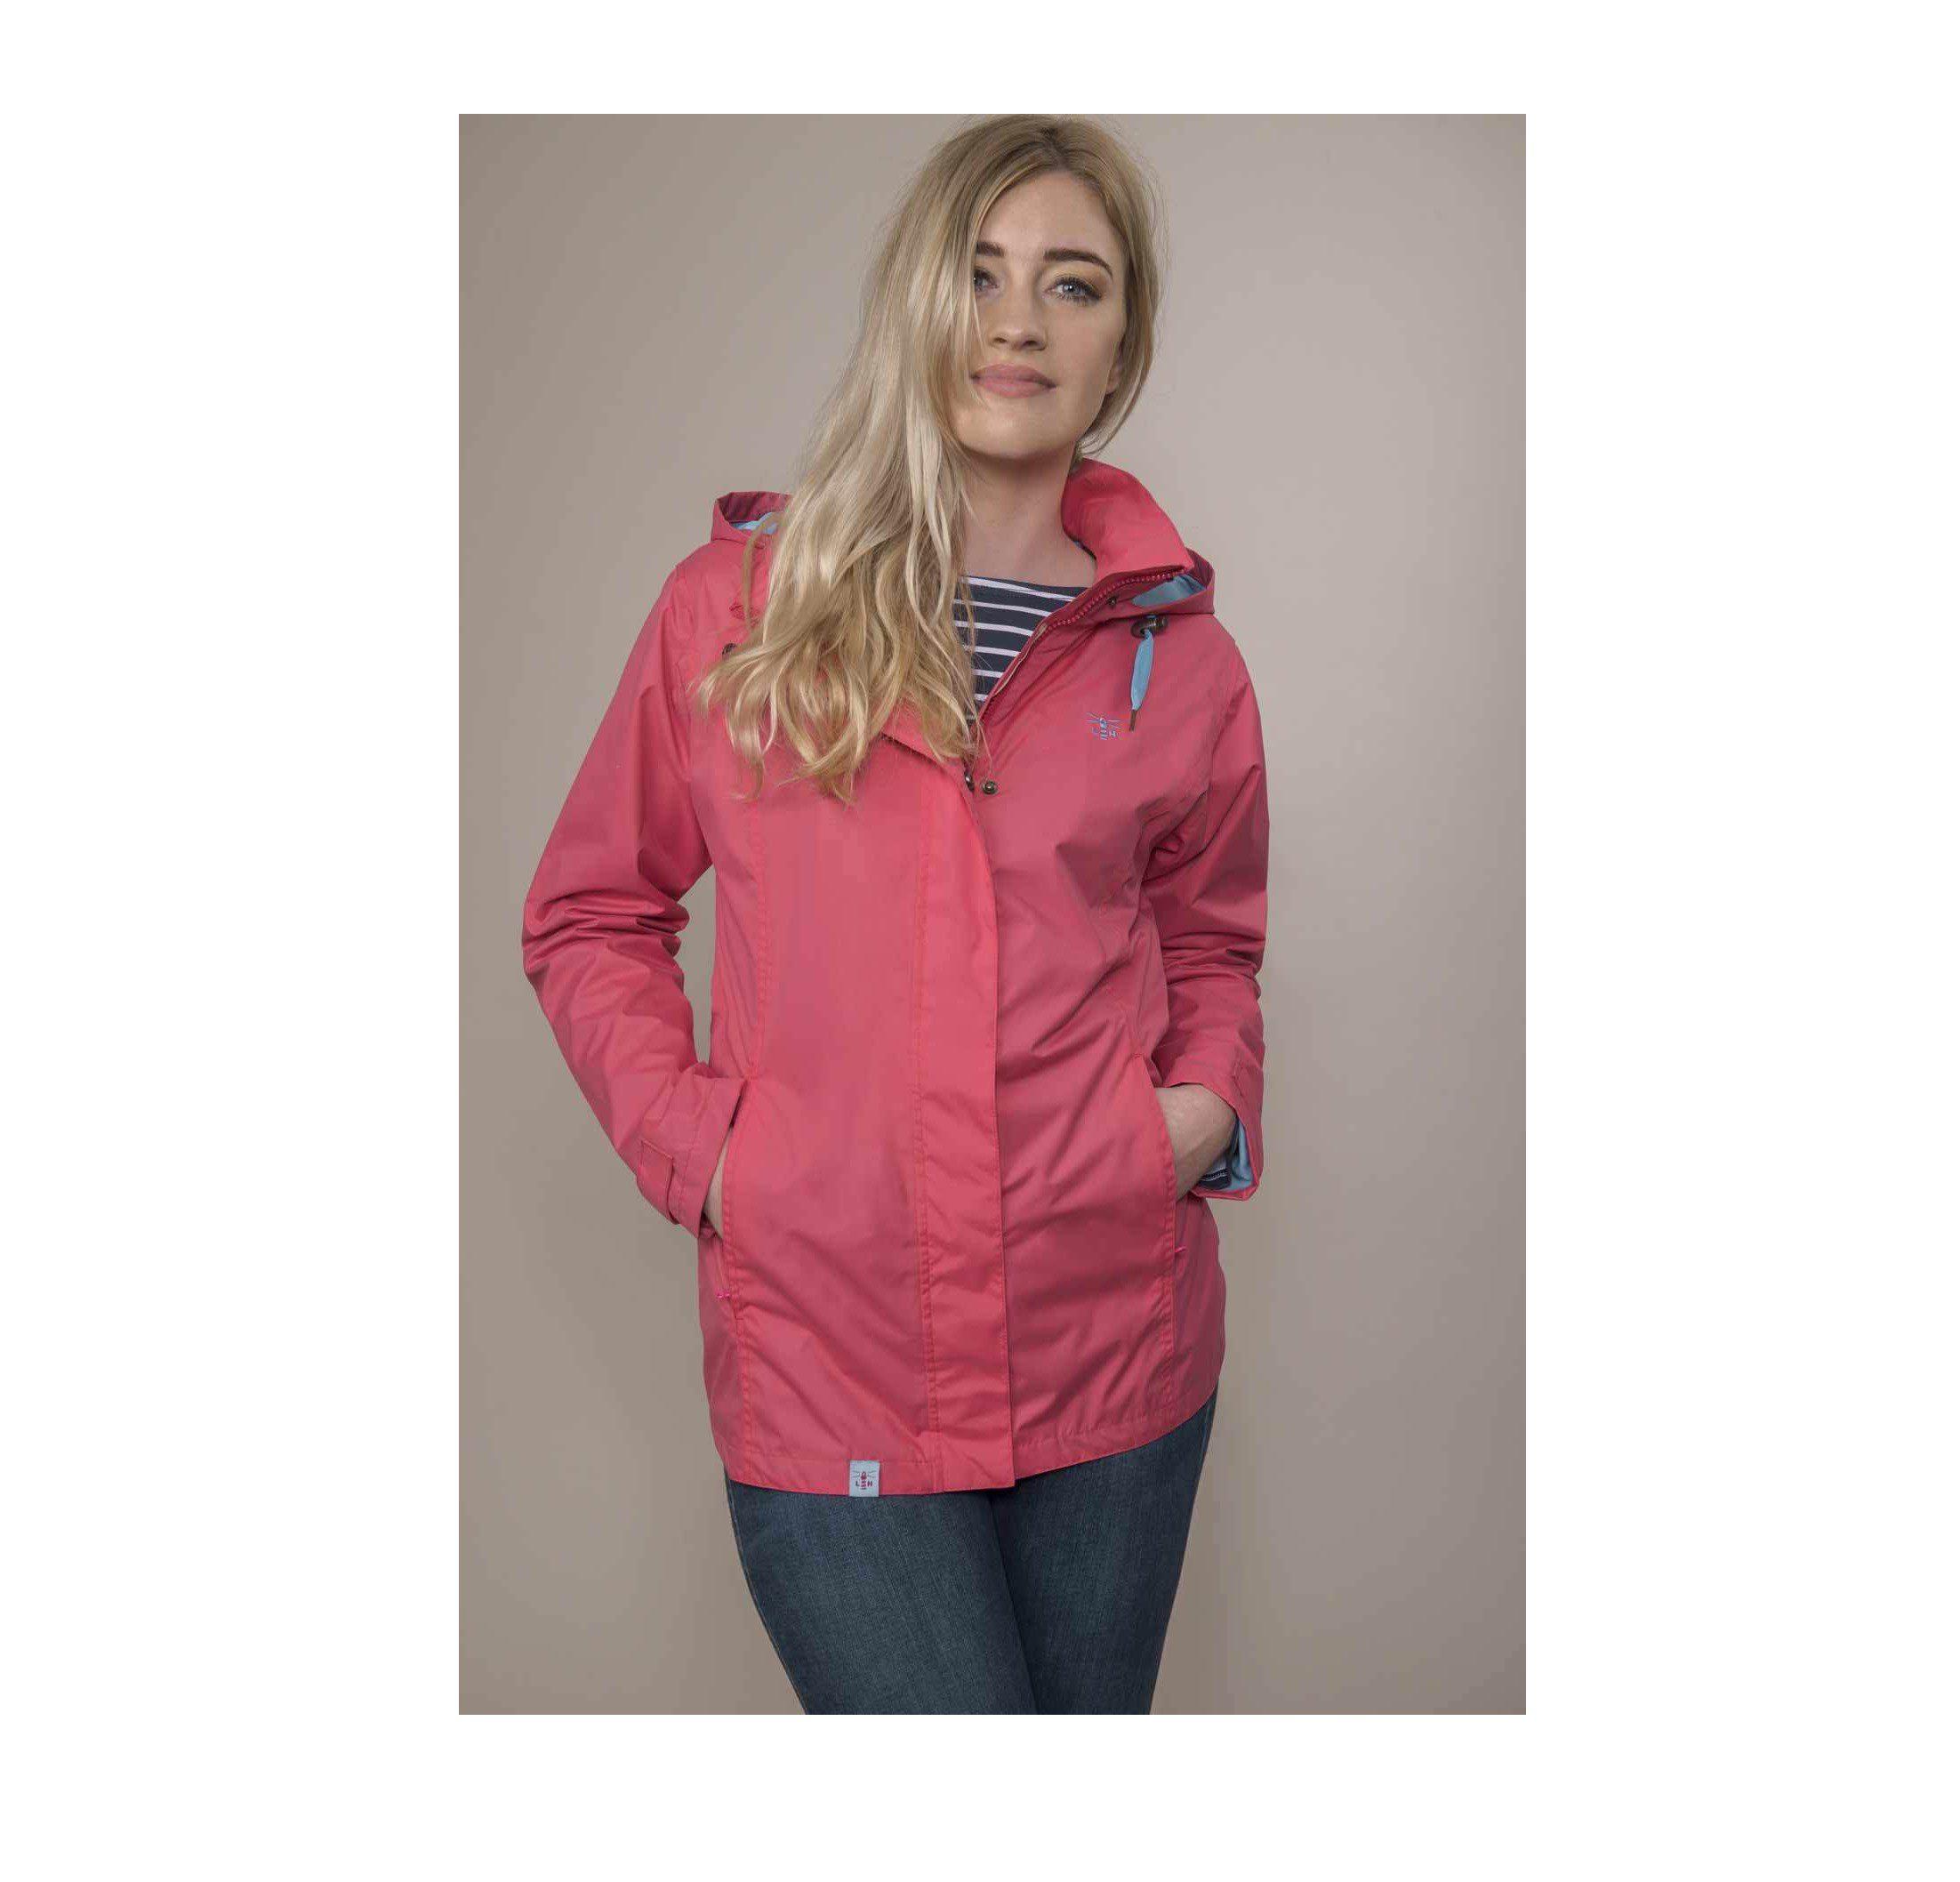 Lighthouse Women's Beachcomber Jacket - Scarlet